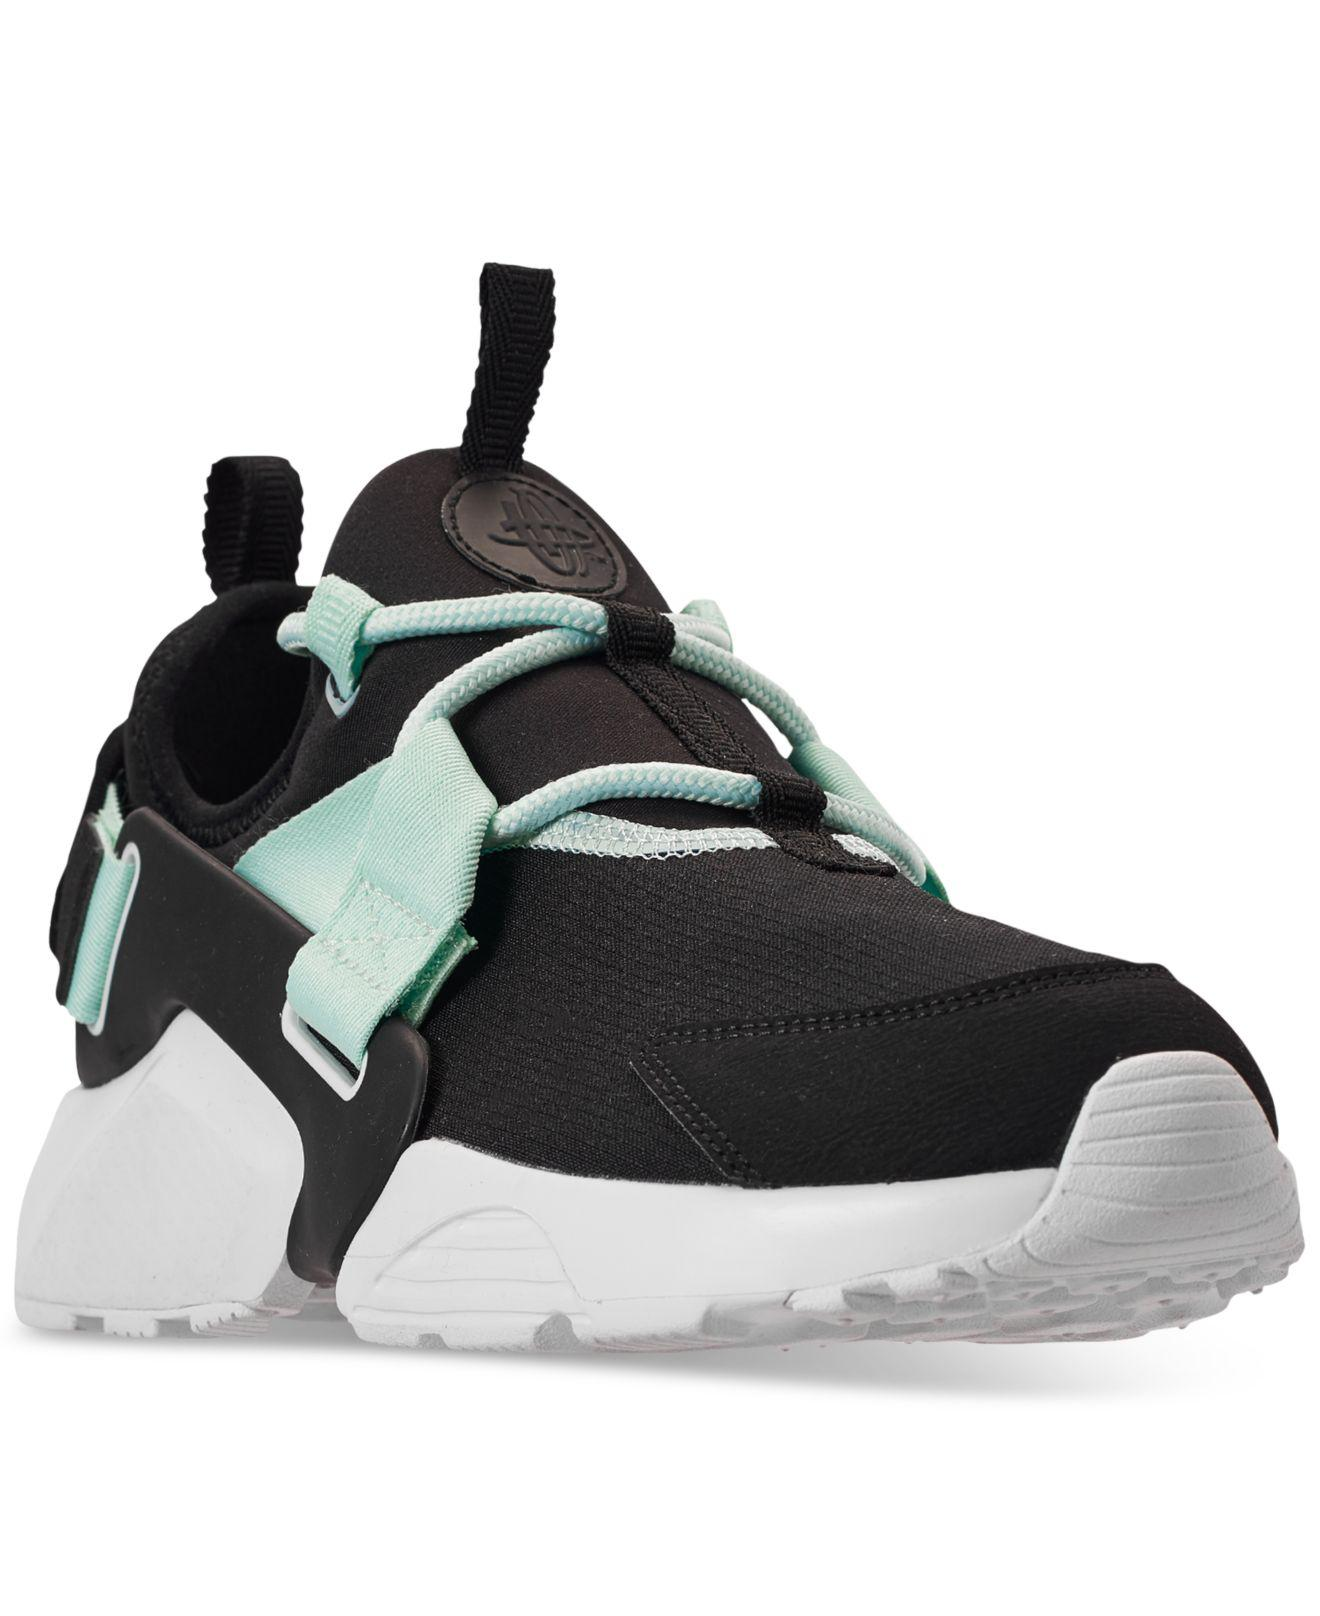 3932e6007dcc2 Lyst - Nike Air Huarache City Sneaker in Black - Save 25%